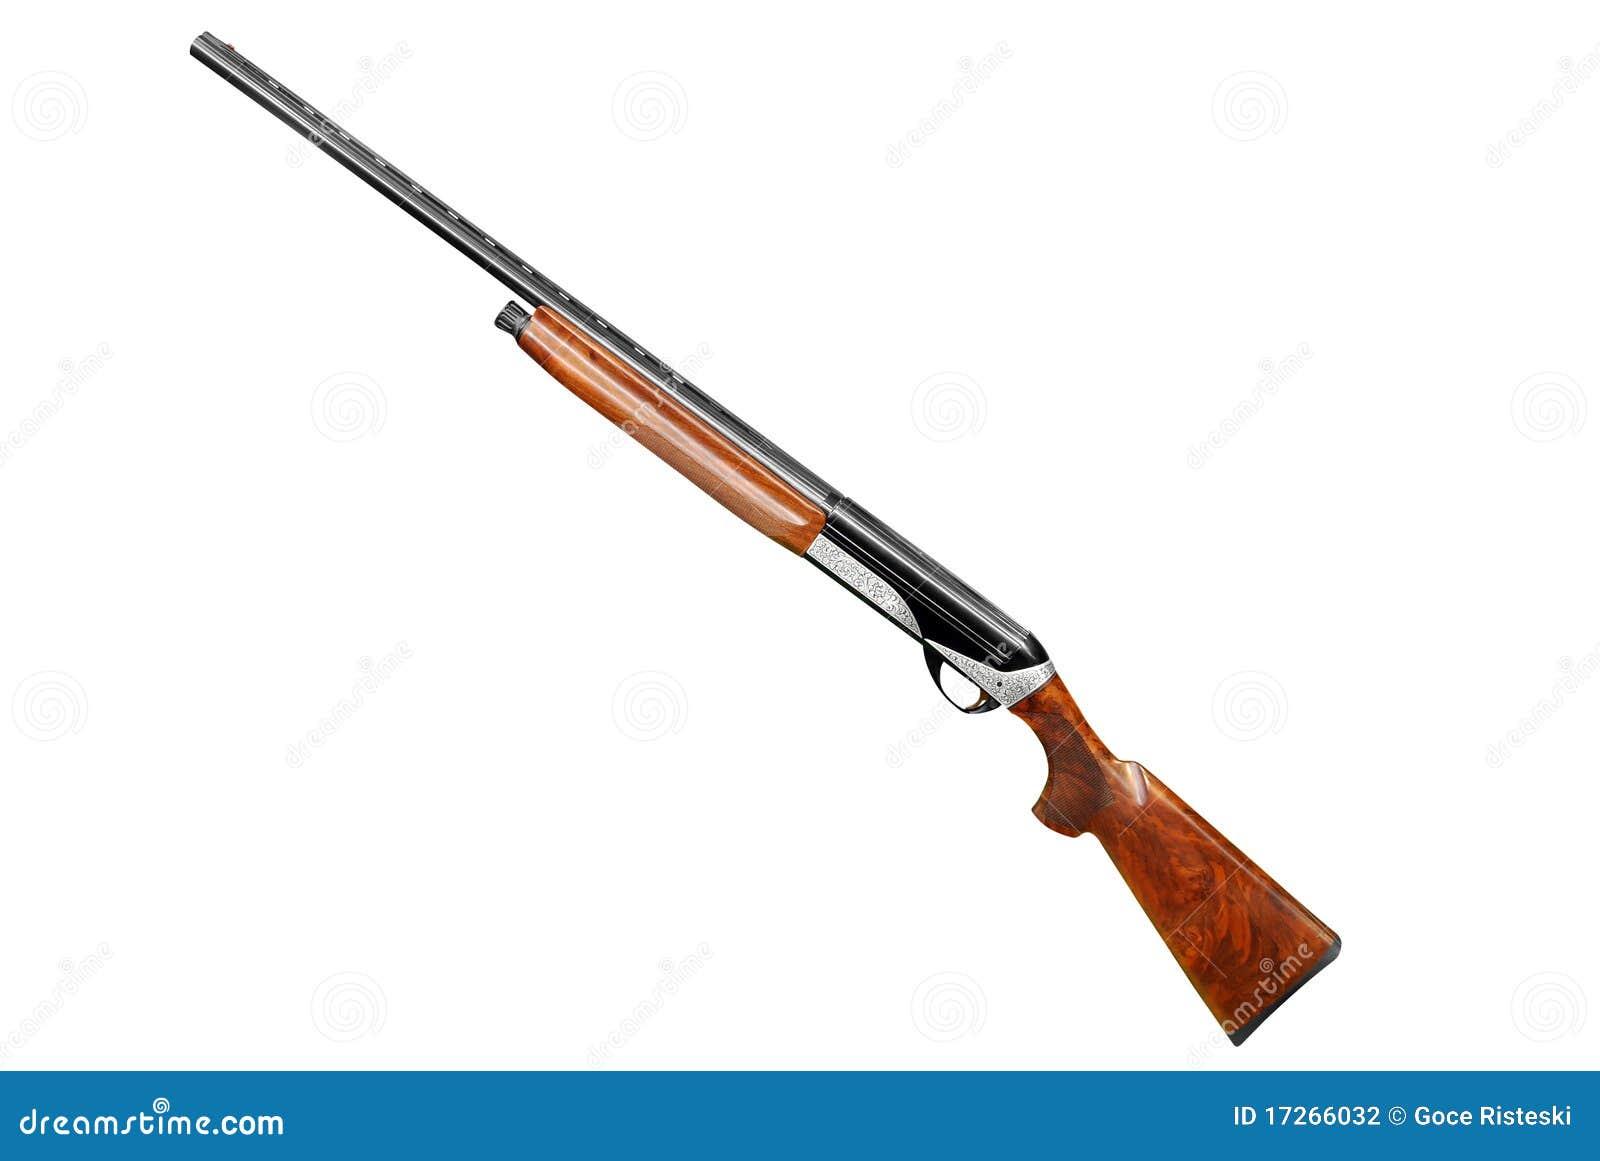 Hunting Shotgun Isolated On White Stock Photography - Image: 17266032